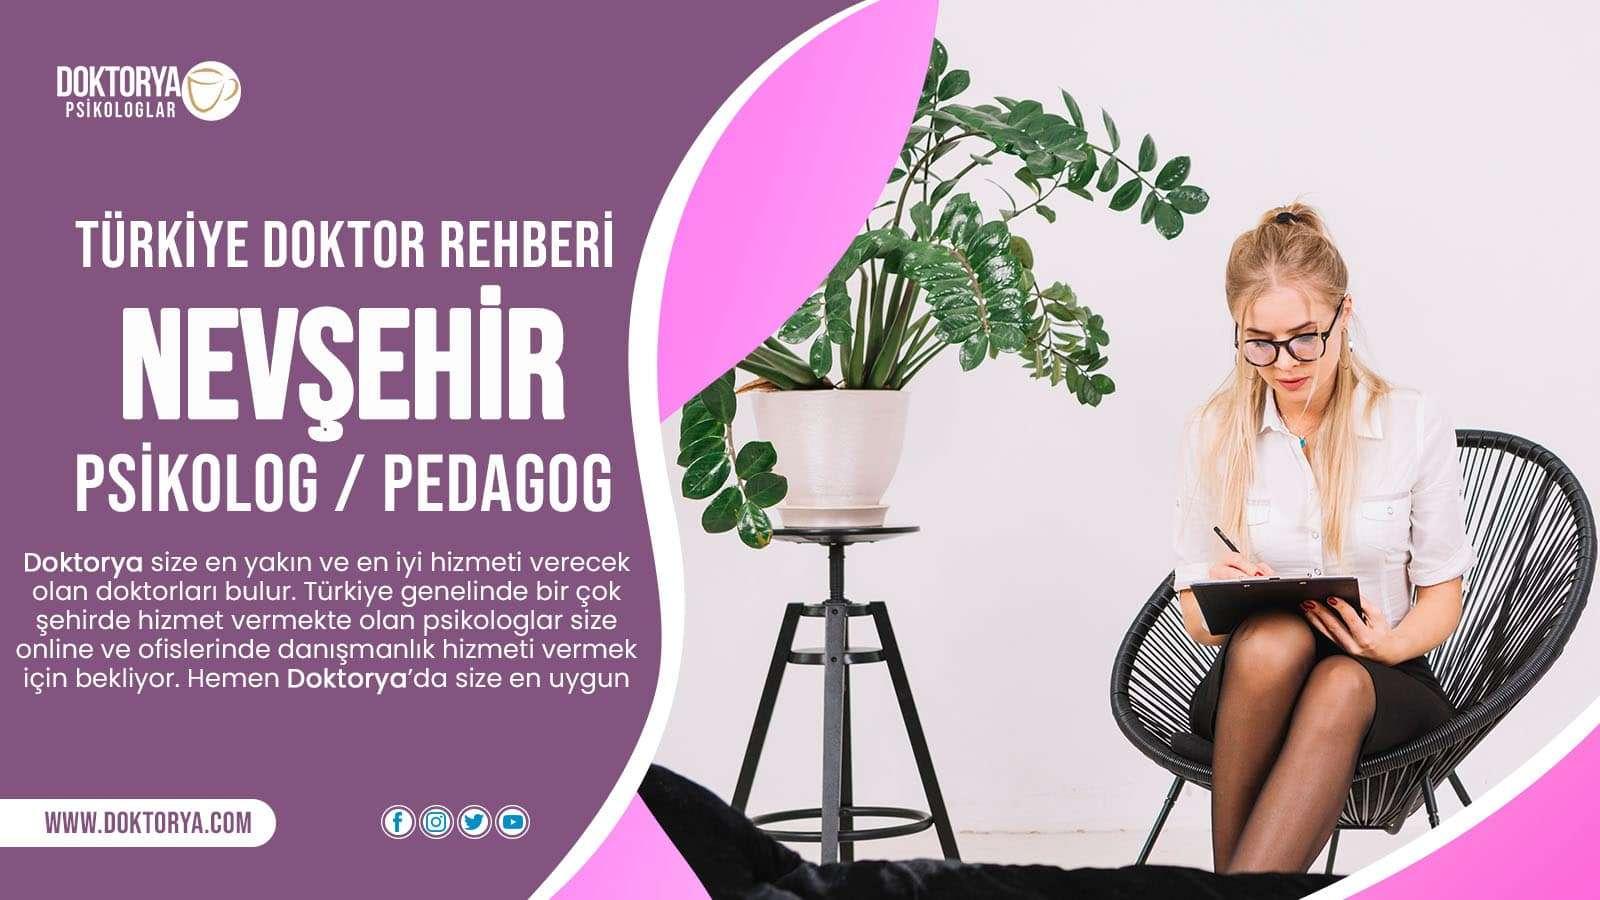 Nevşehir Psikolog